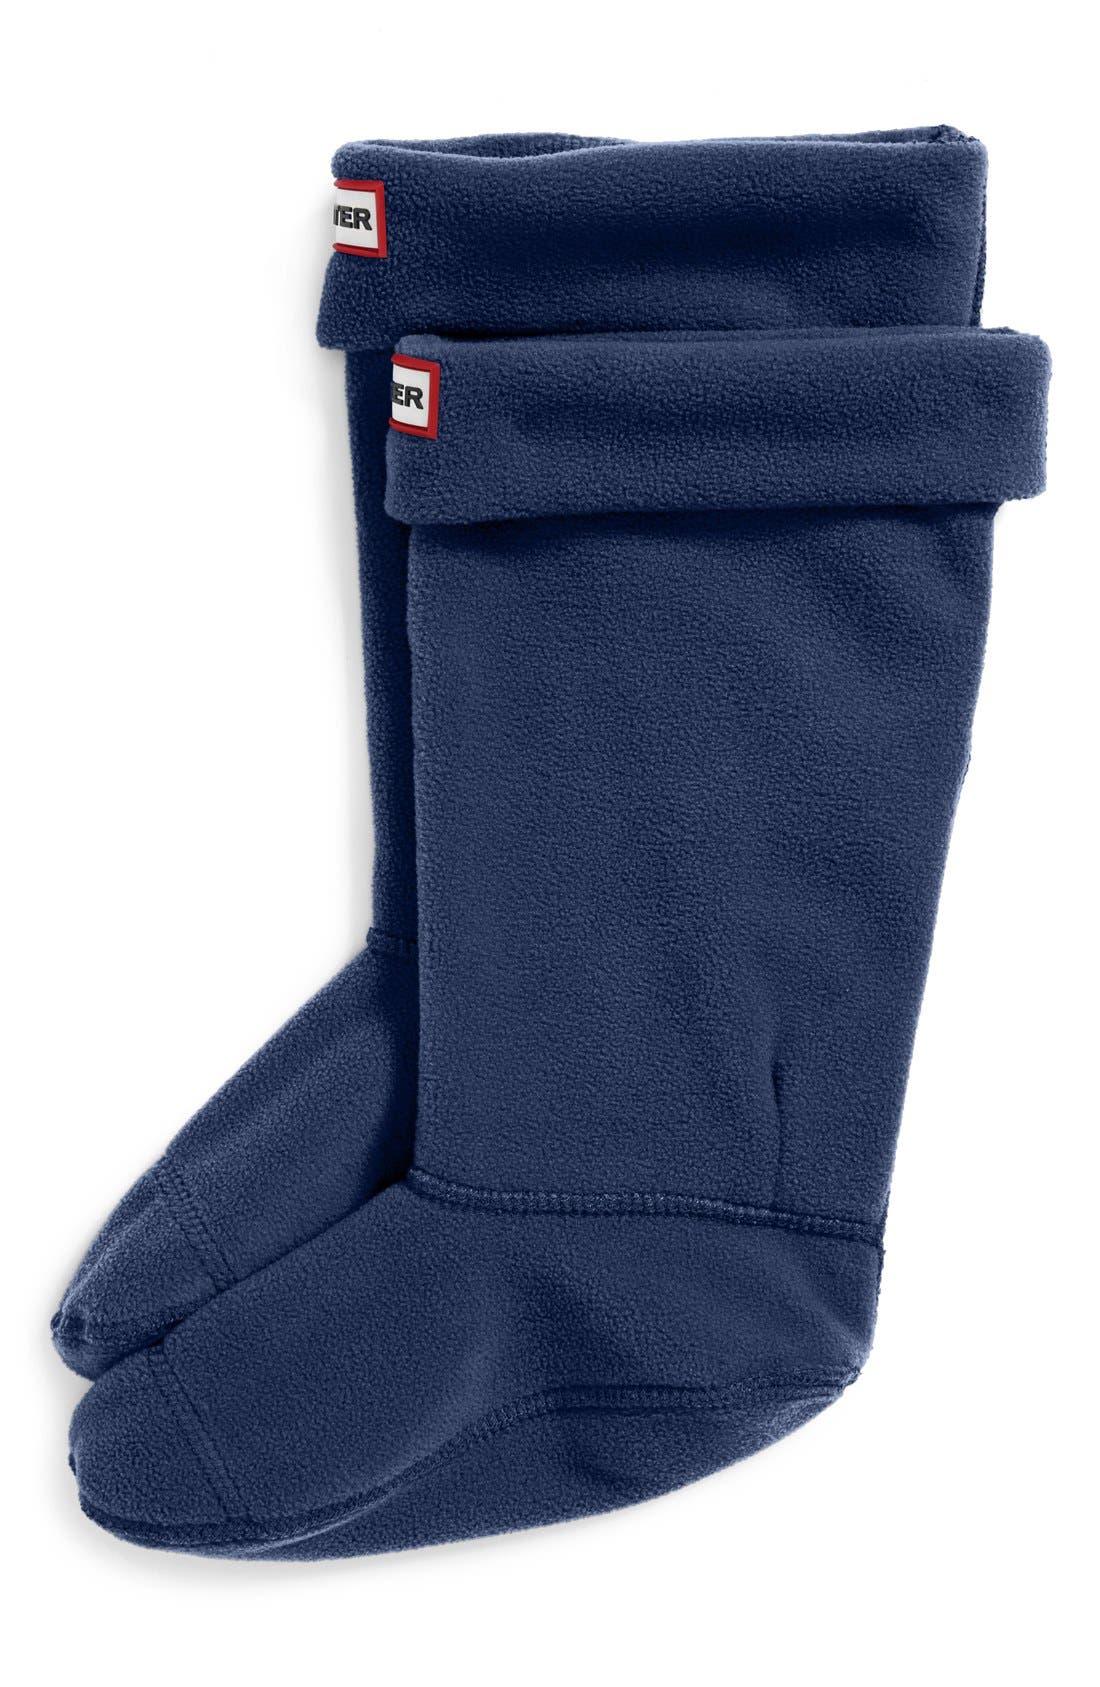 HUNTER Fleece Welly Boot Socks, Main, color, NAVY